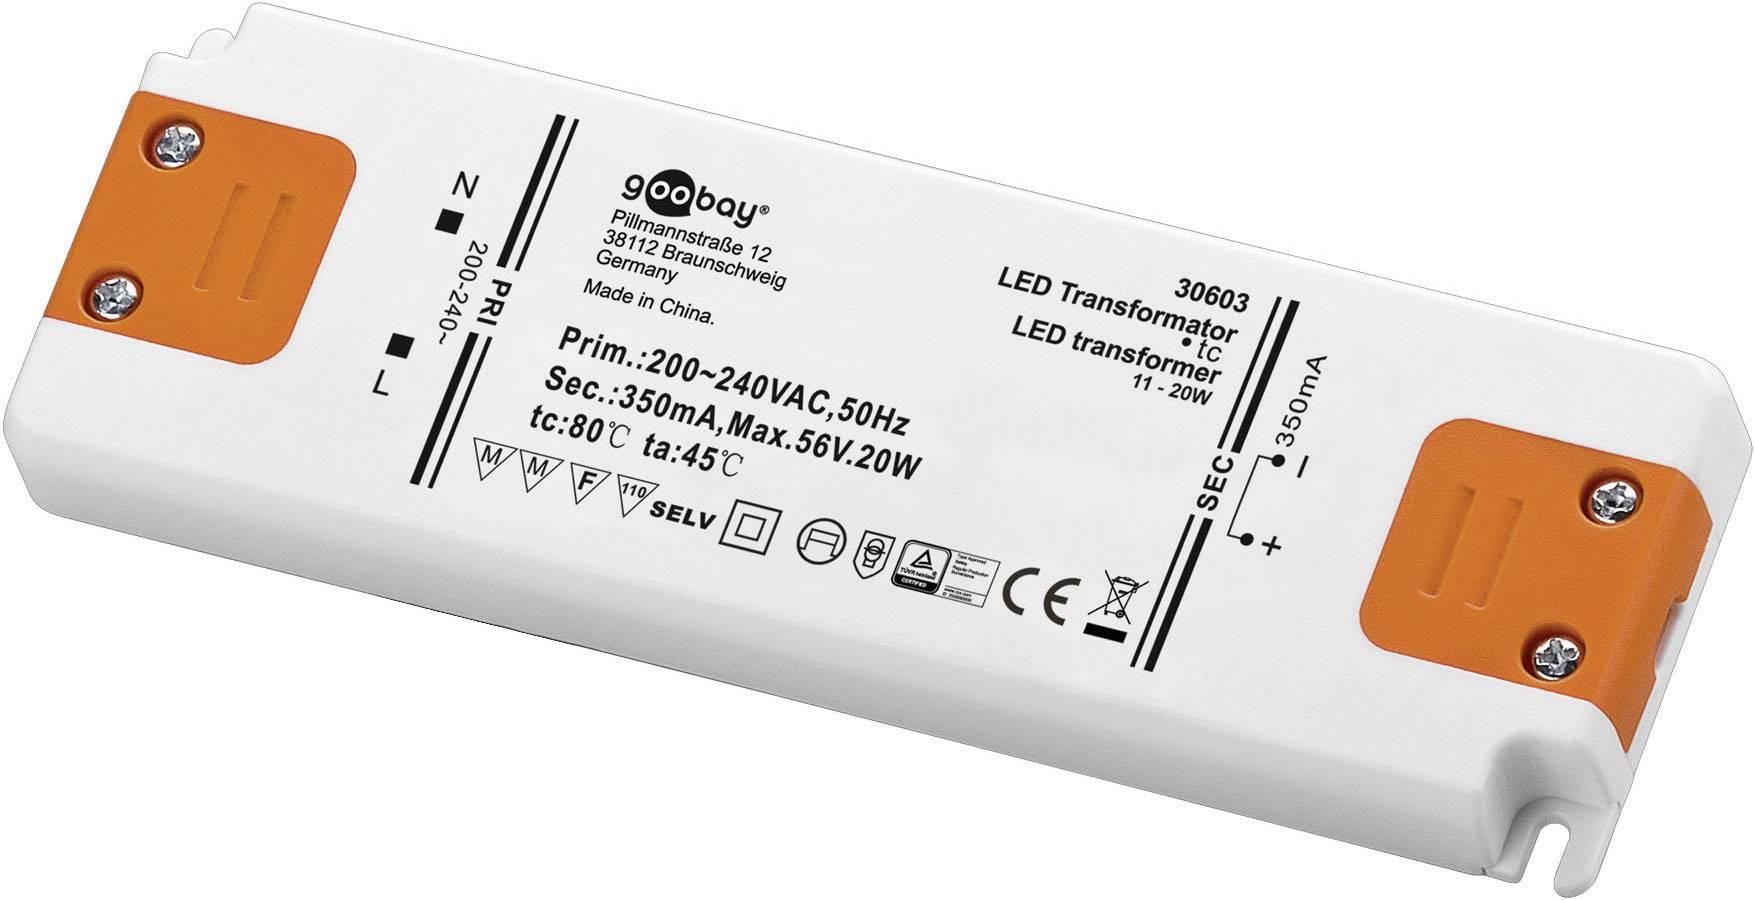 Vstavateľný LED driver Goobay SET CC 350-20 LED, 20 W (max), 0.35 A, 0 - 56 V/DC